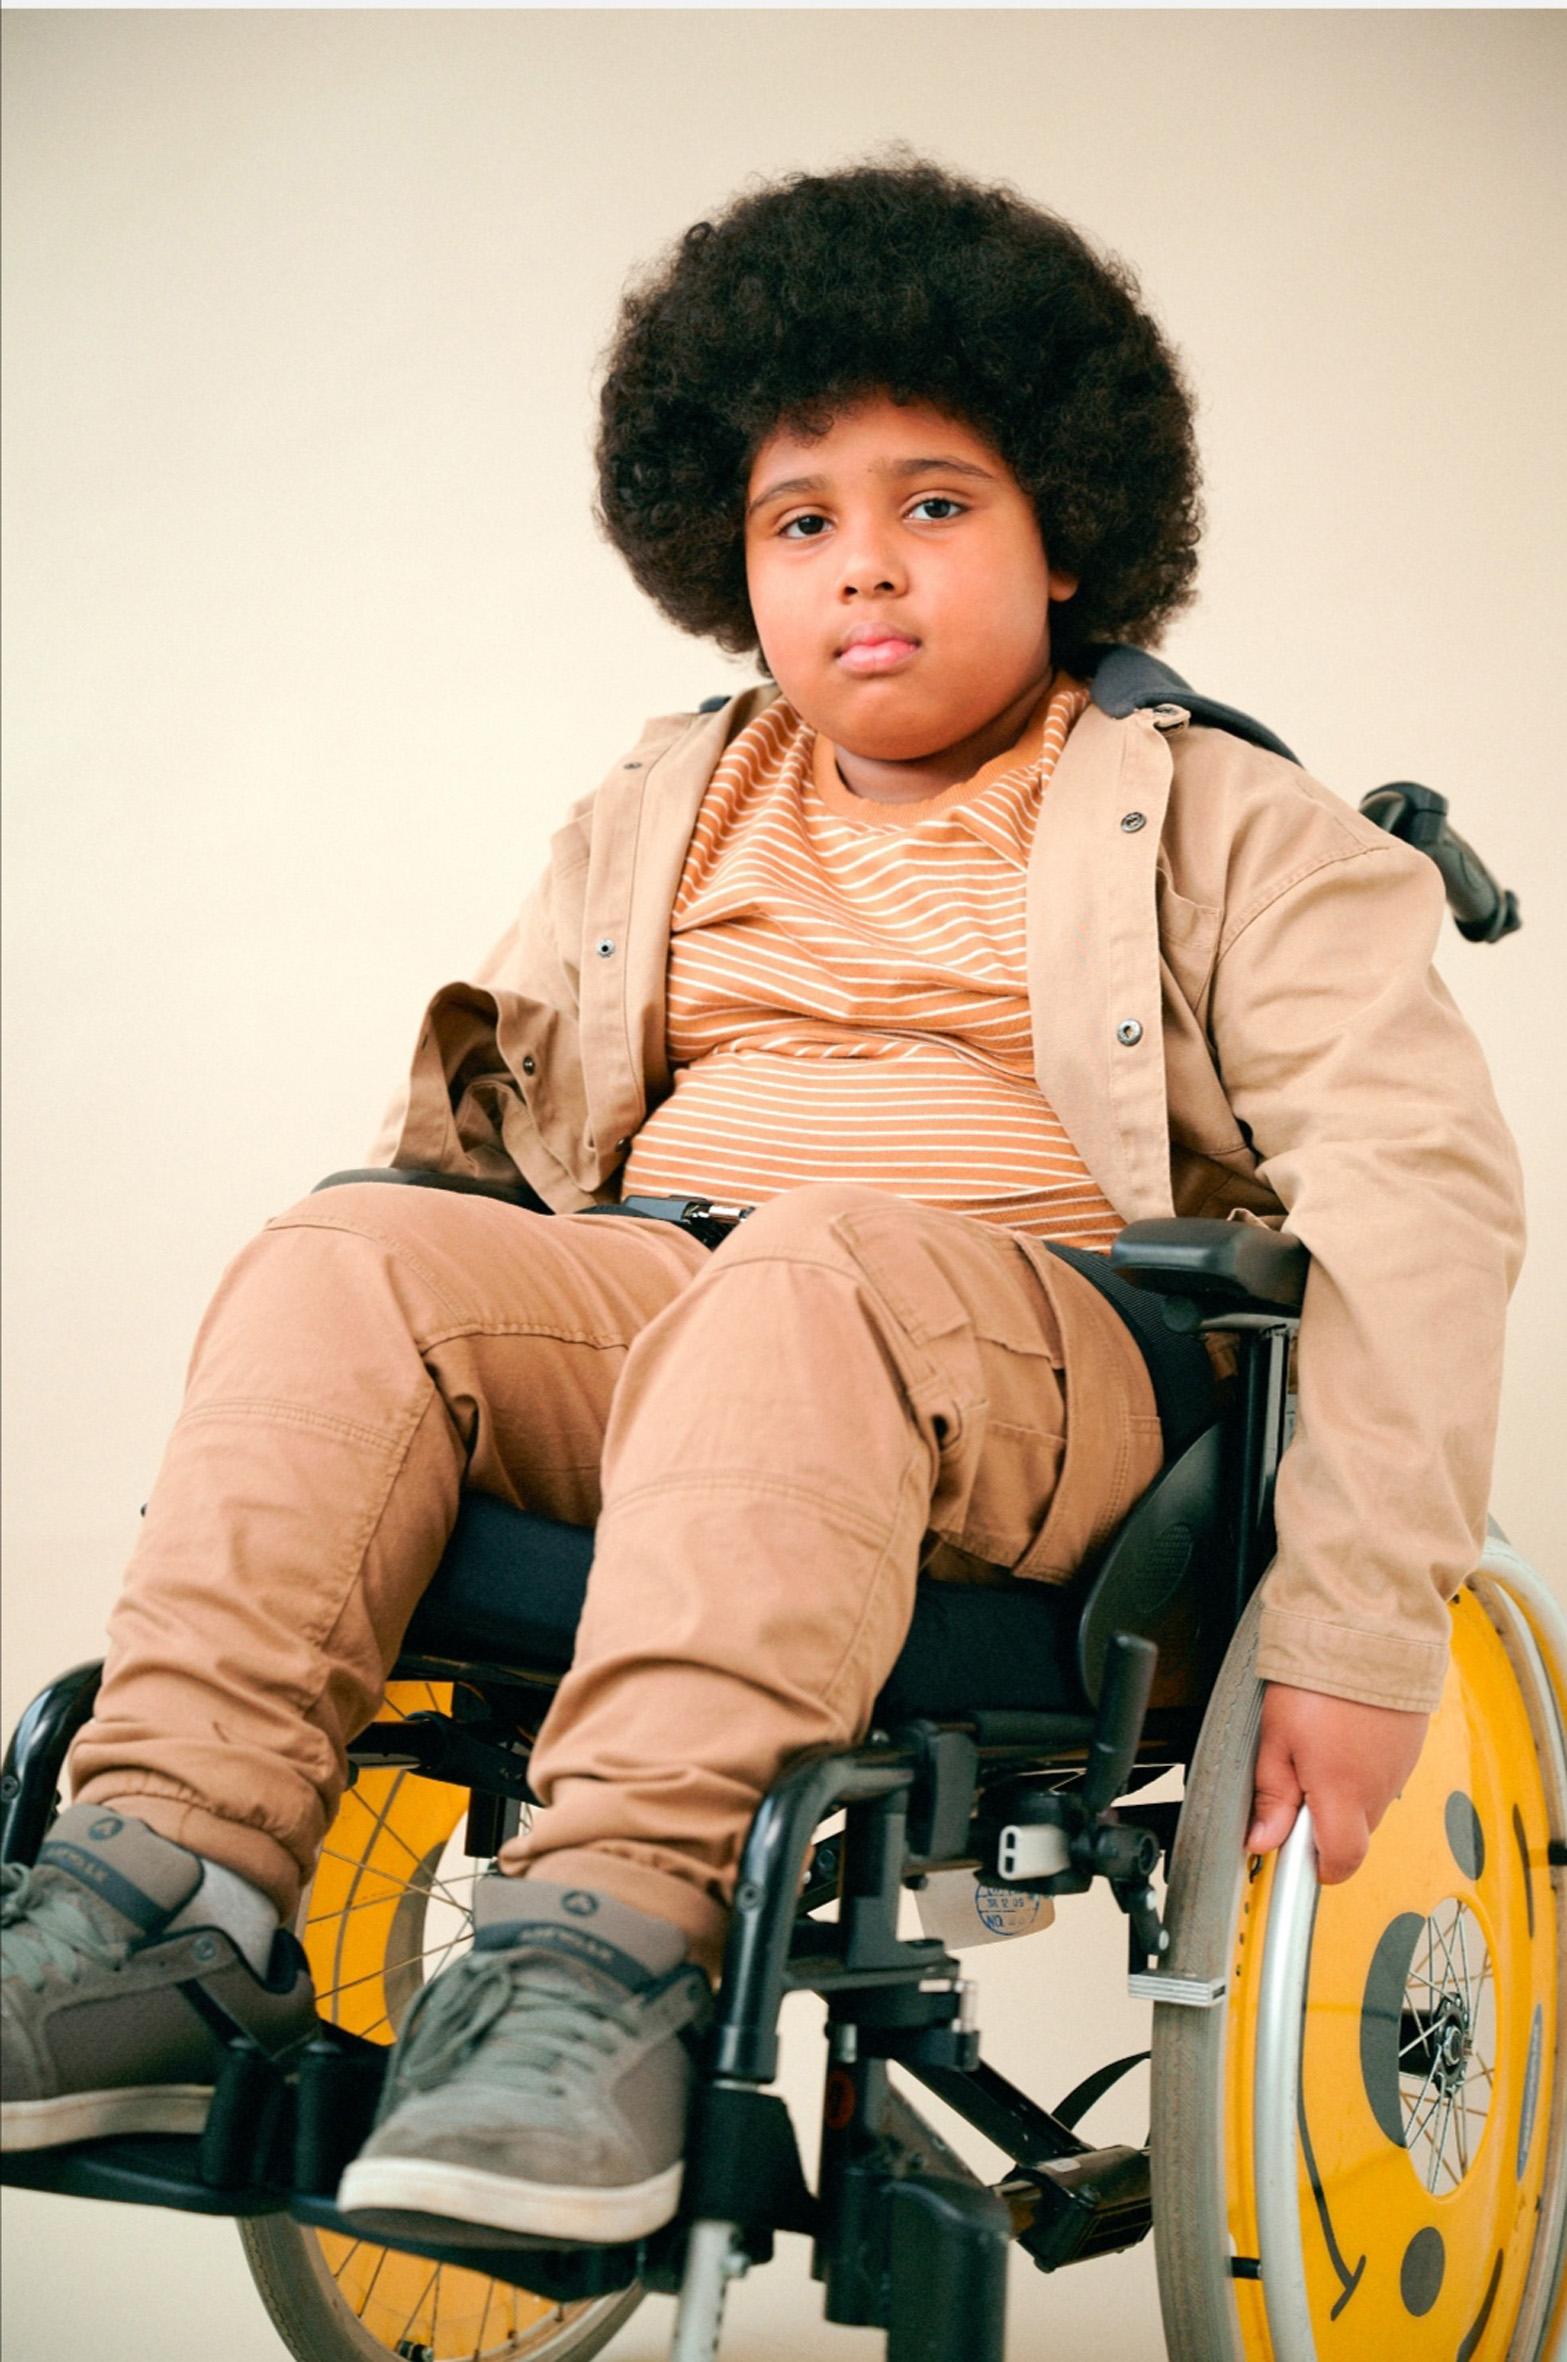 Noah, Autism, Zebedee Management, disabl